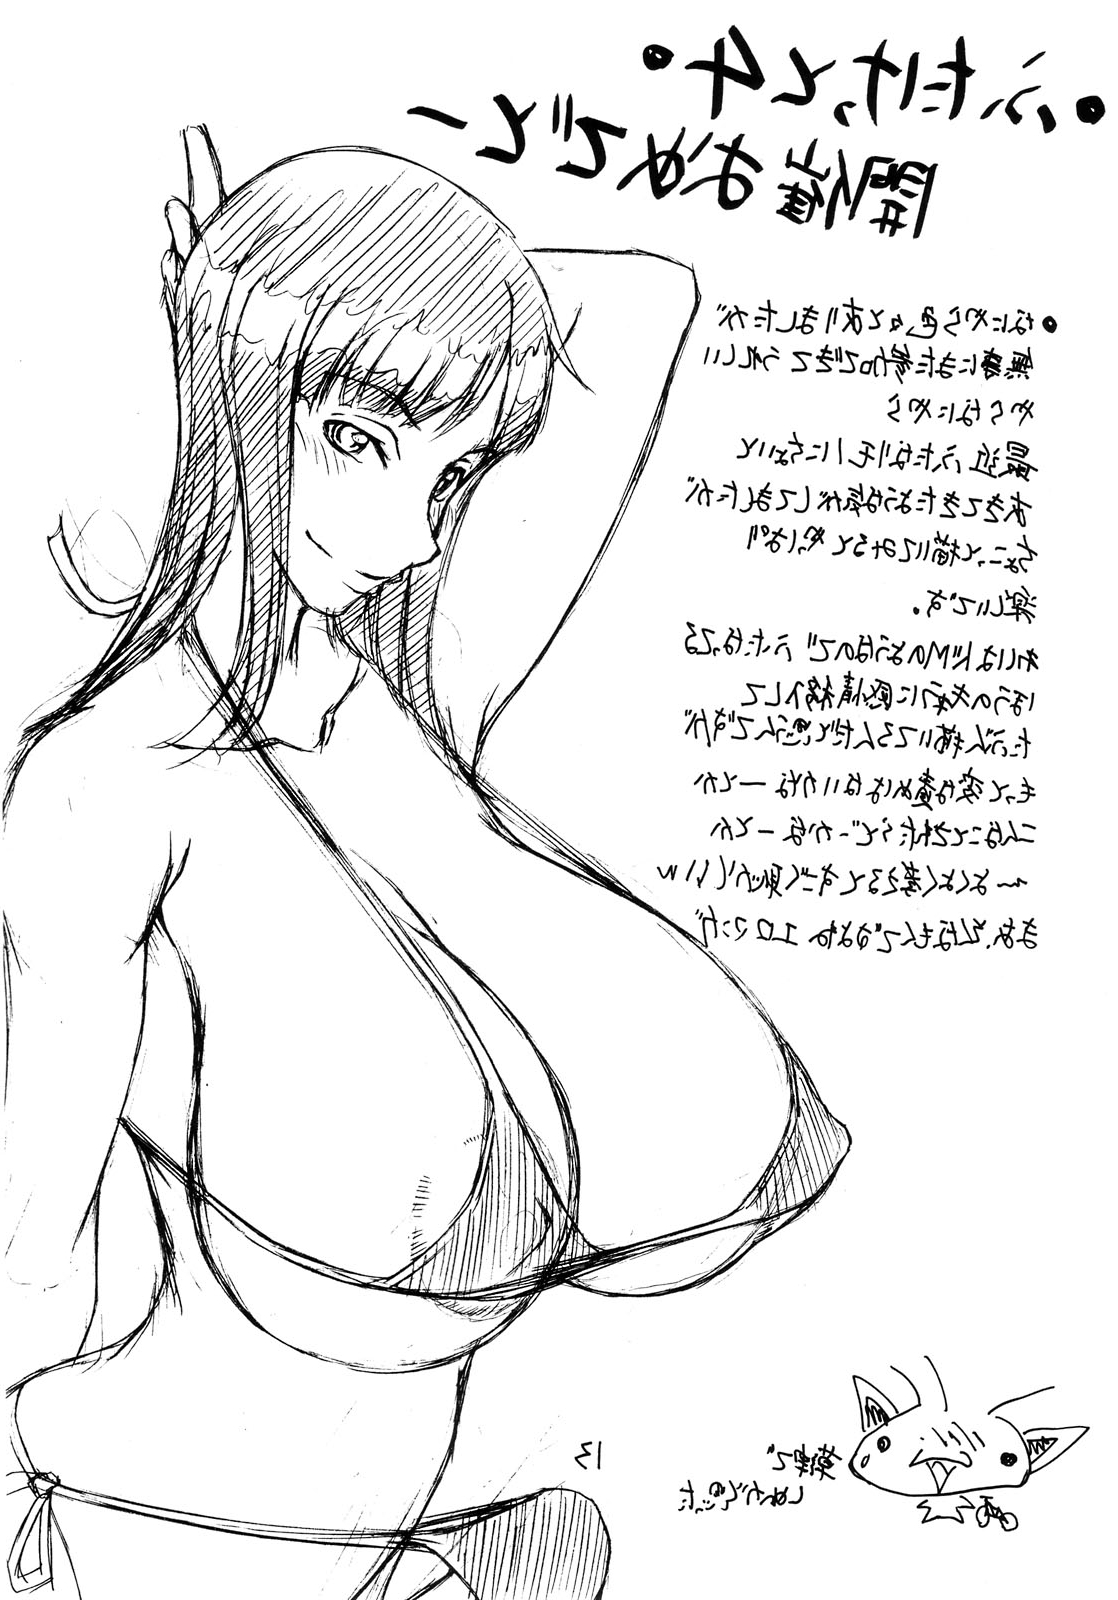 Toon sex pic ##00013084100 futanari nico robin one piece tagme